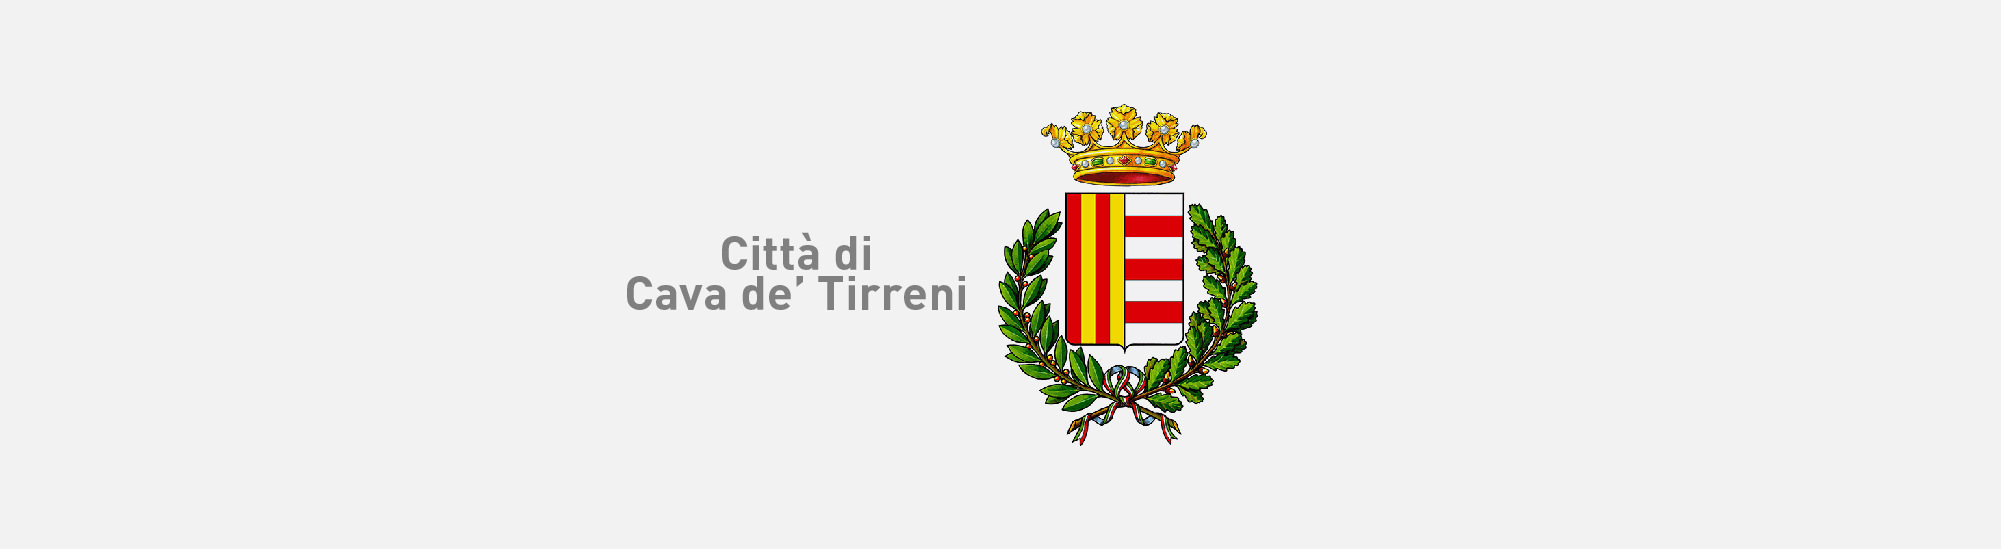 Header Comune Cava de' Tirreni